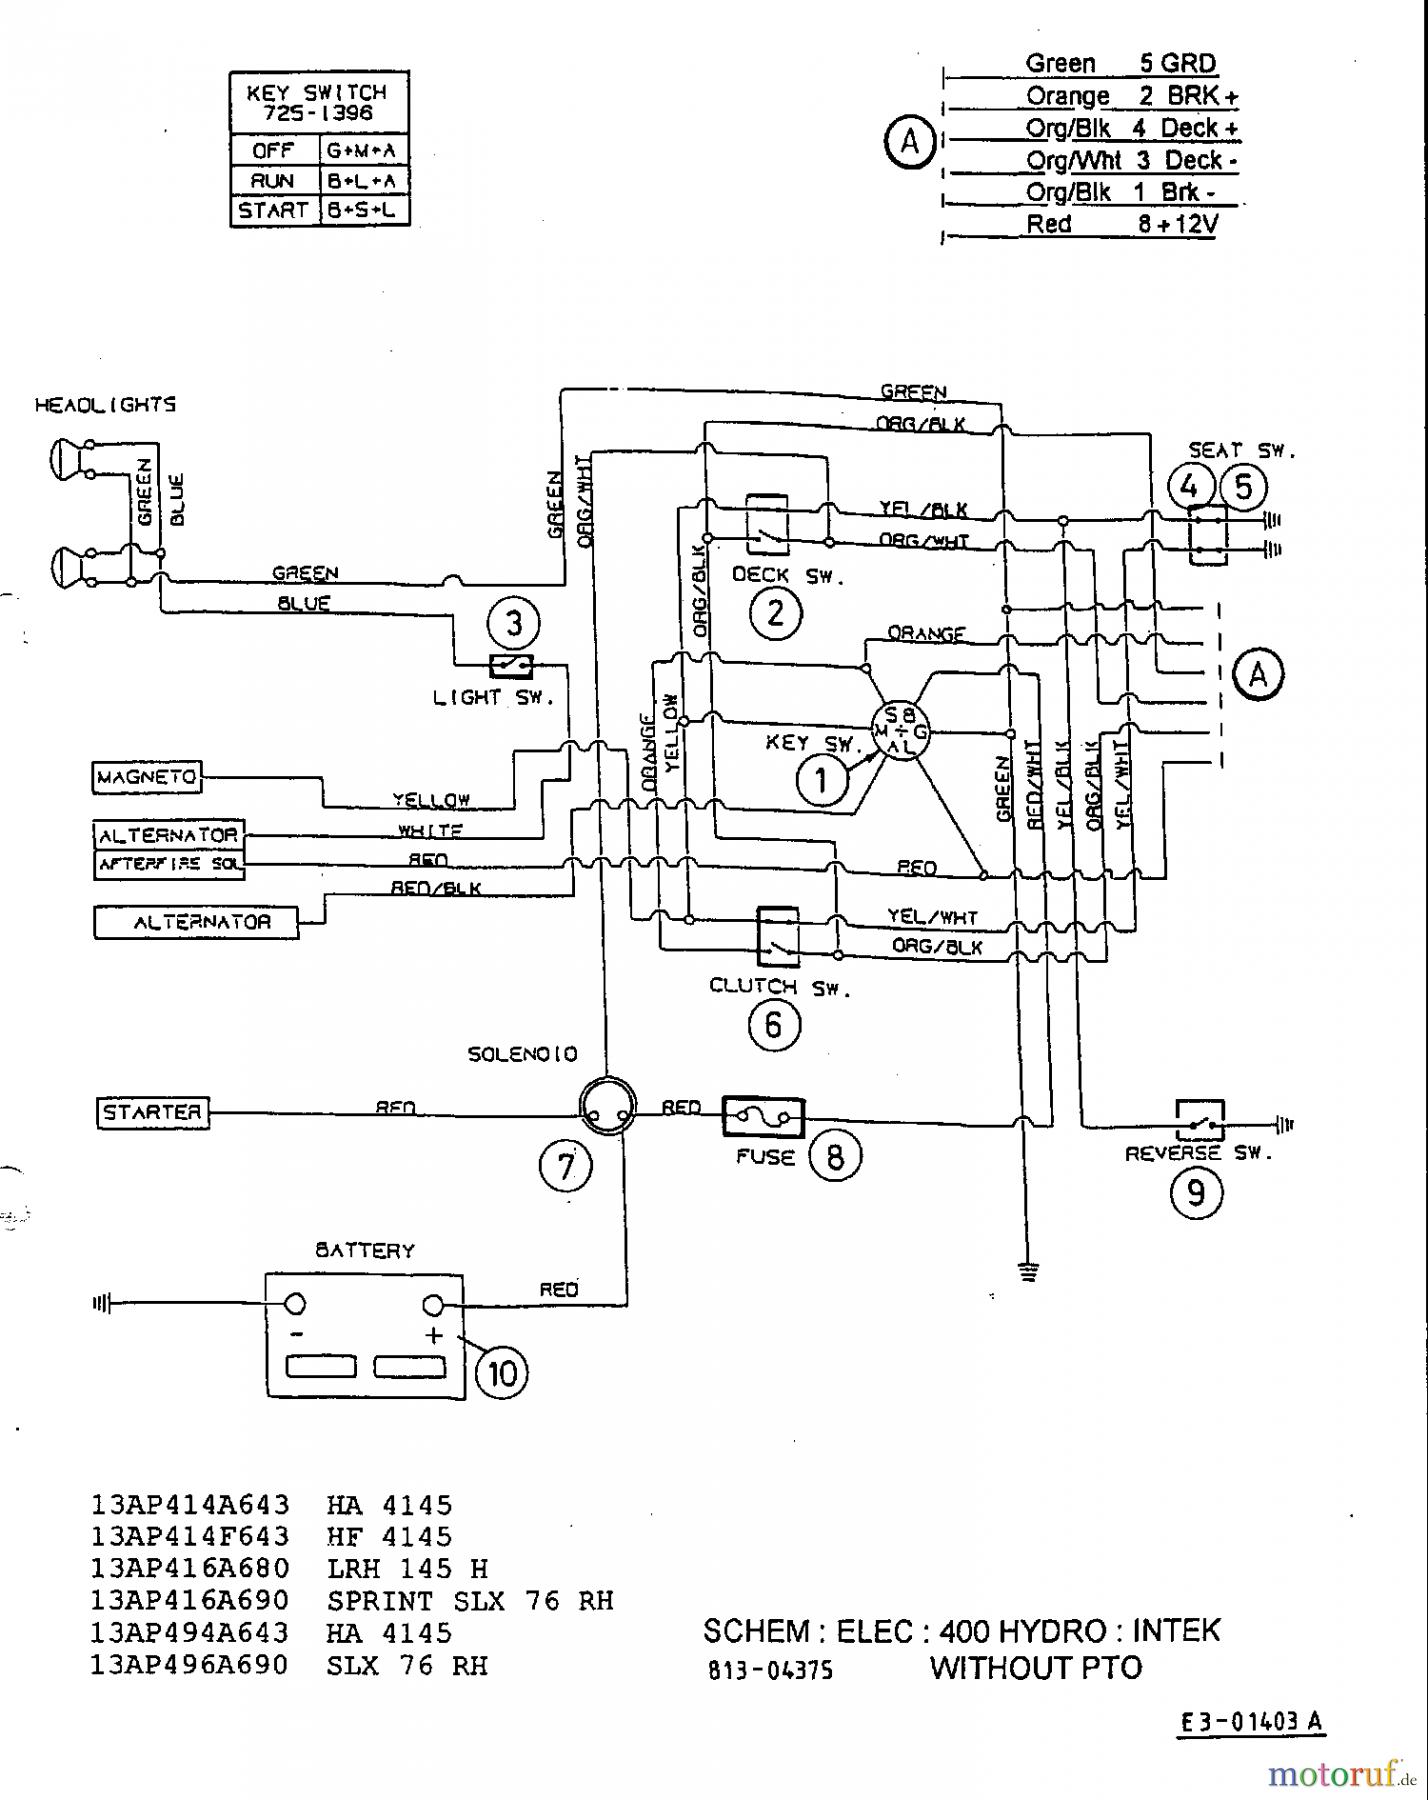 Mtd Riding Mower Wiring Diagram With Yard Machine On | mtd ride on in 2019 | Diagram, Metal